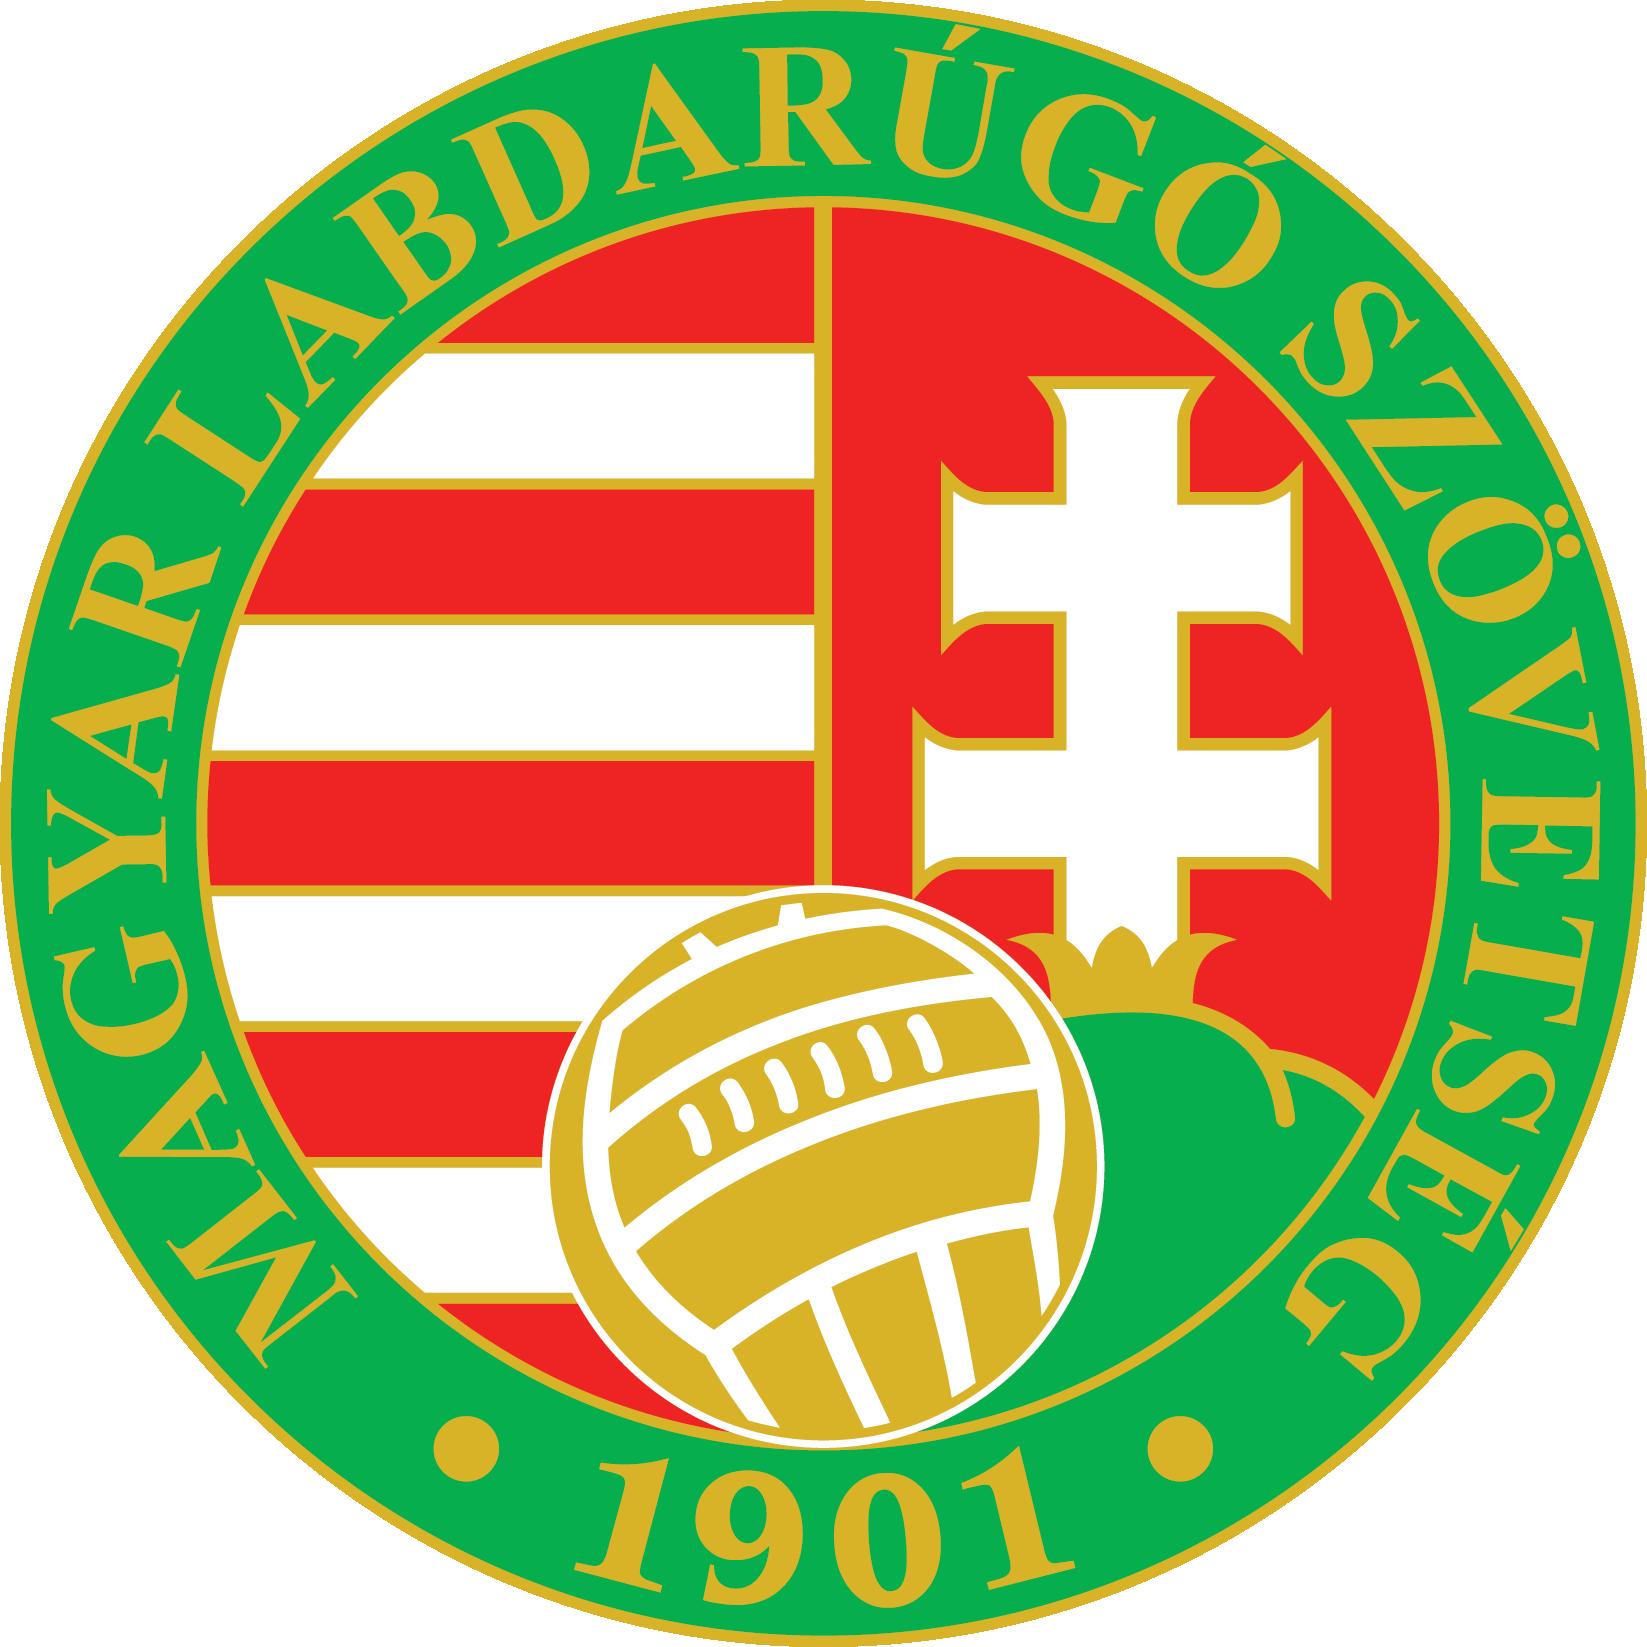 Hongarije O17